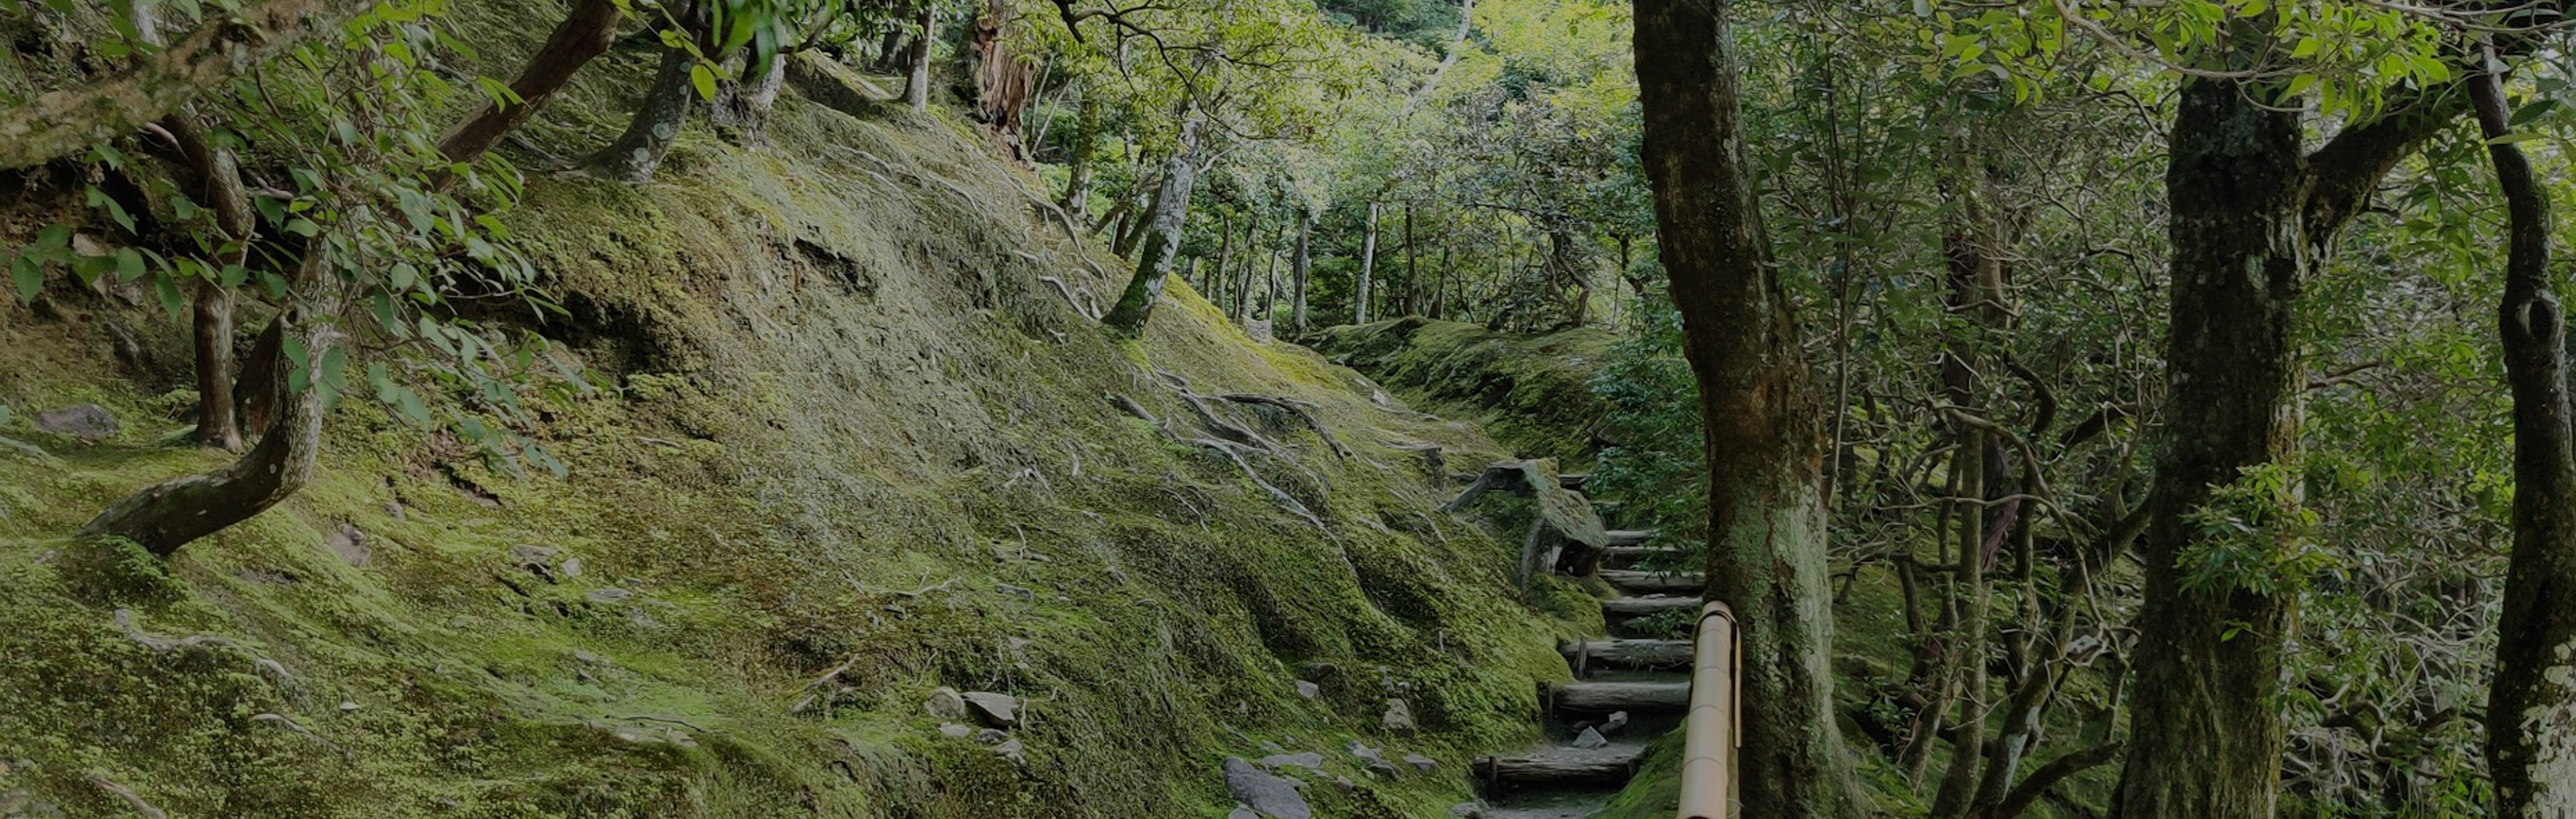 Grapheye Japan